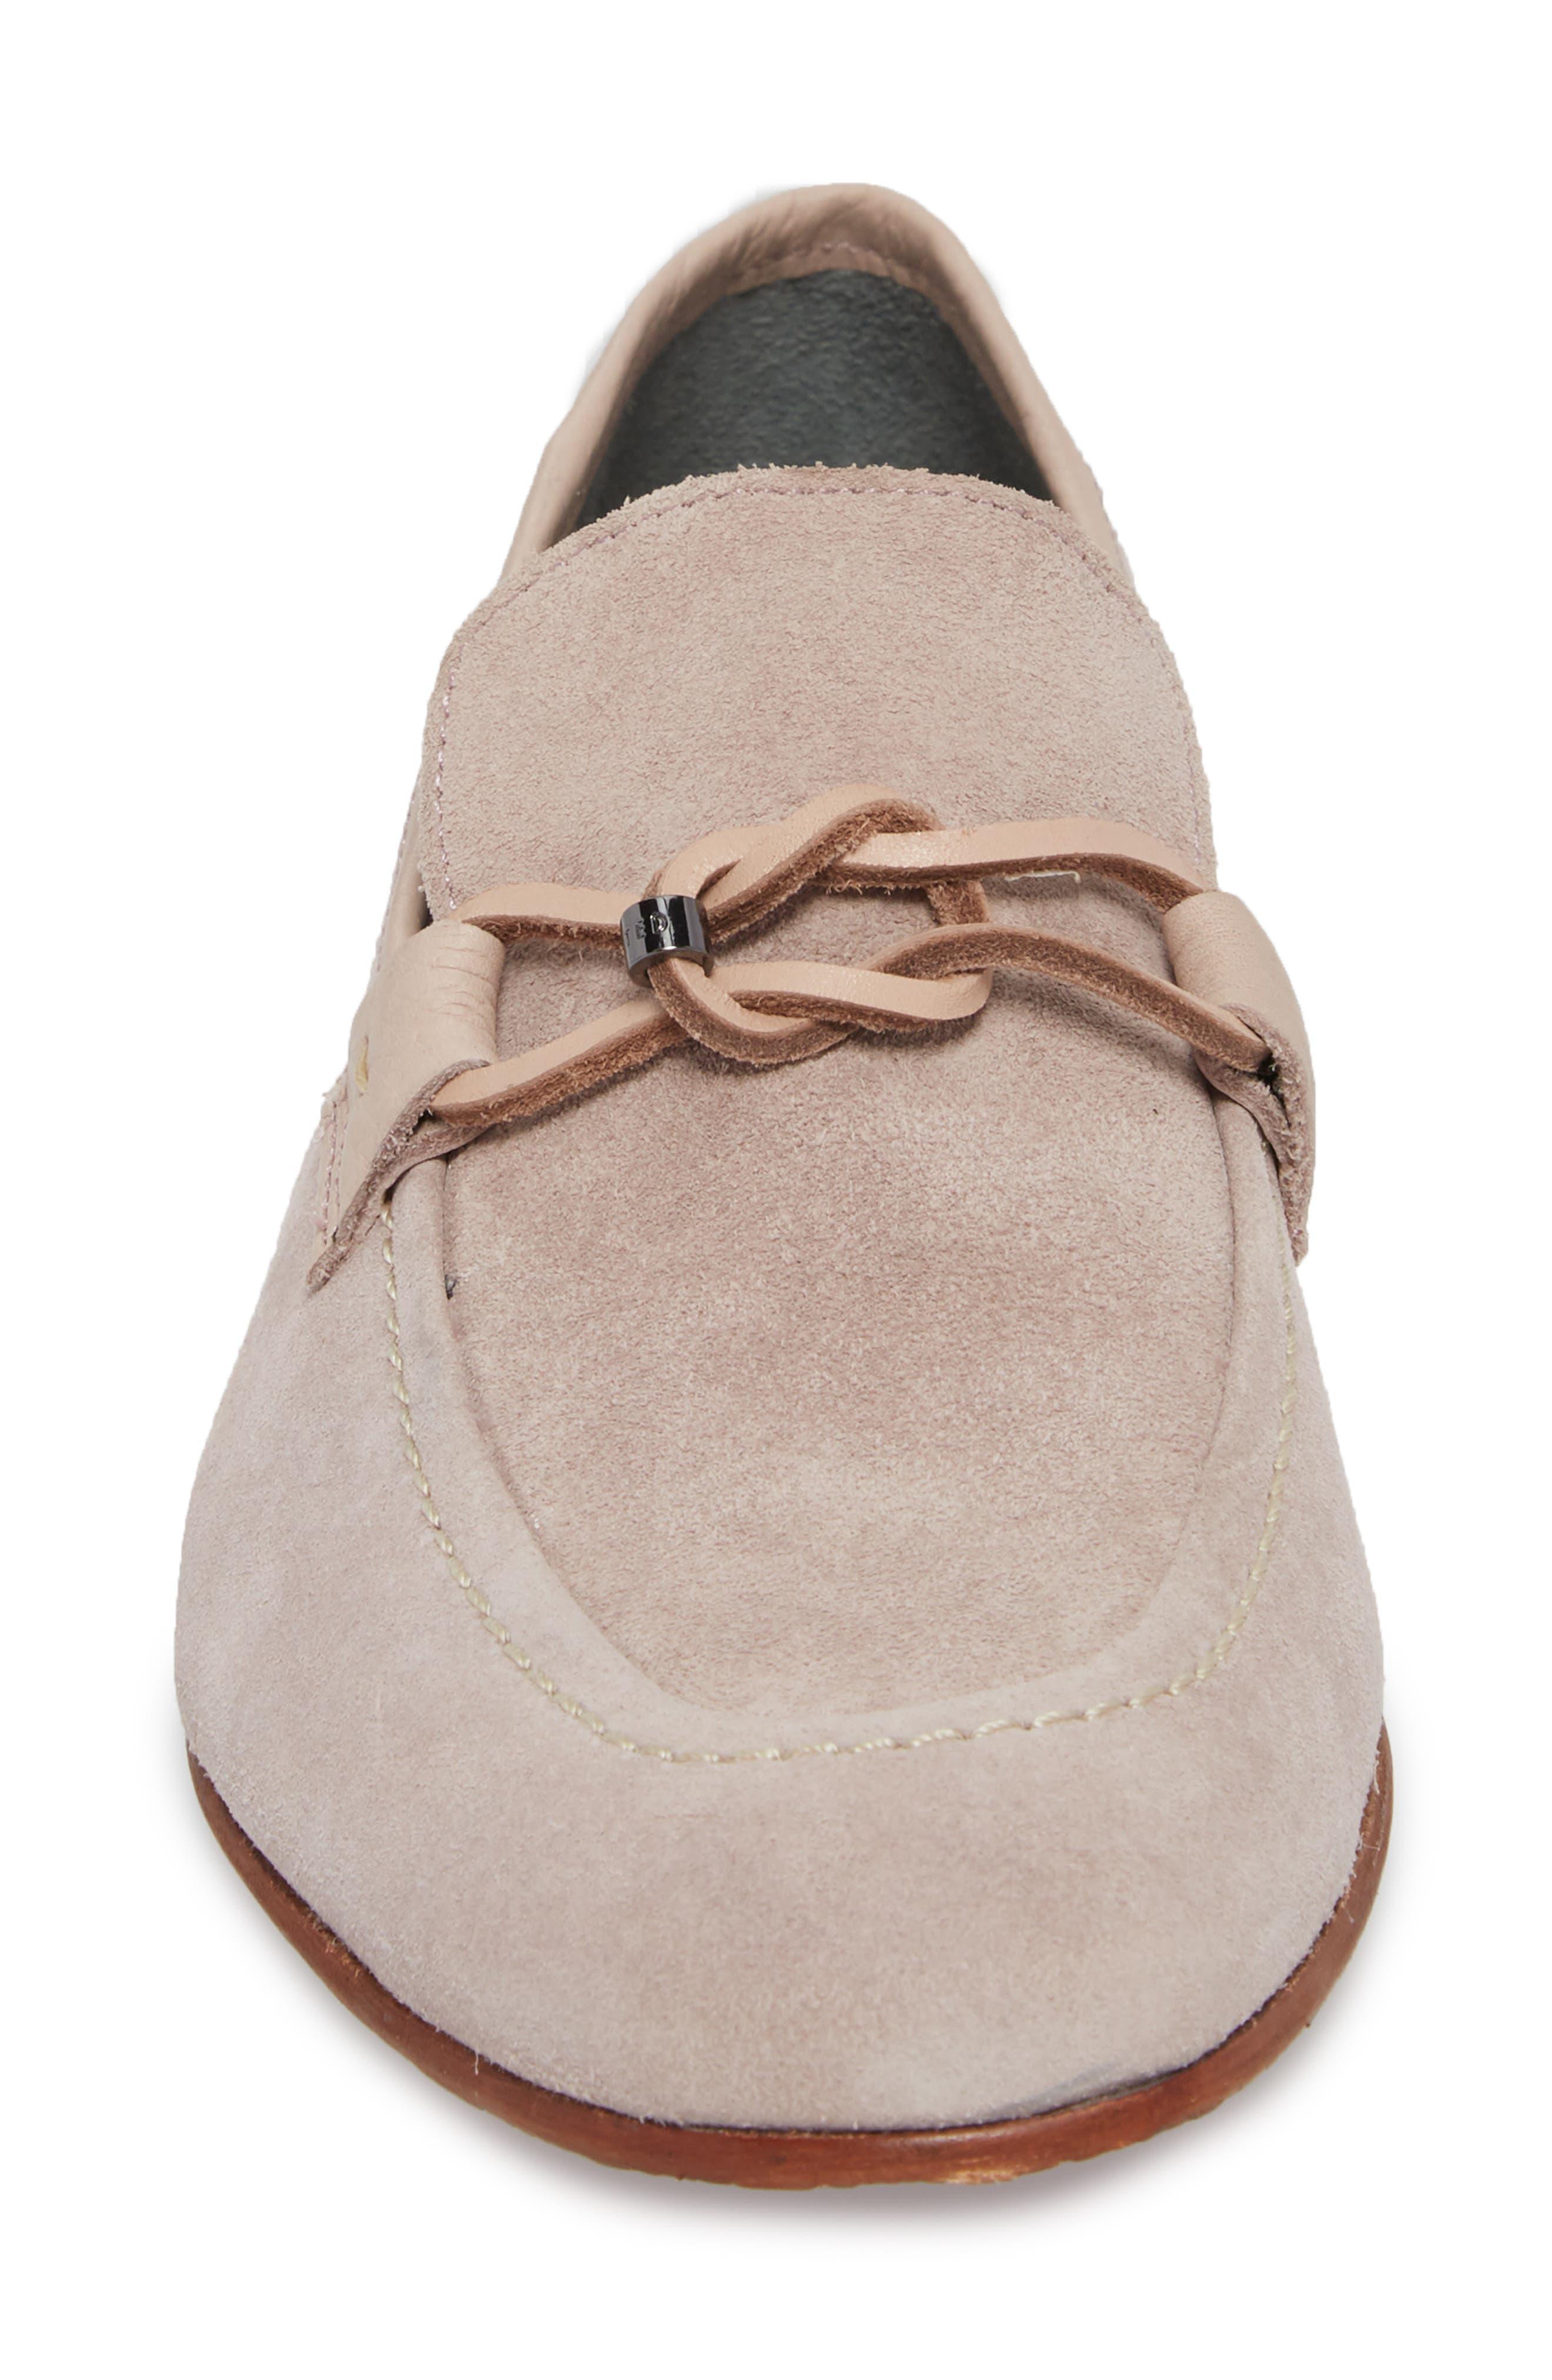 Hoppken Convertible Knotted Loafer,                             Alternate thumbnail 4, color,                             Light Pink Suede